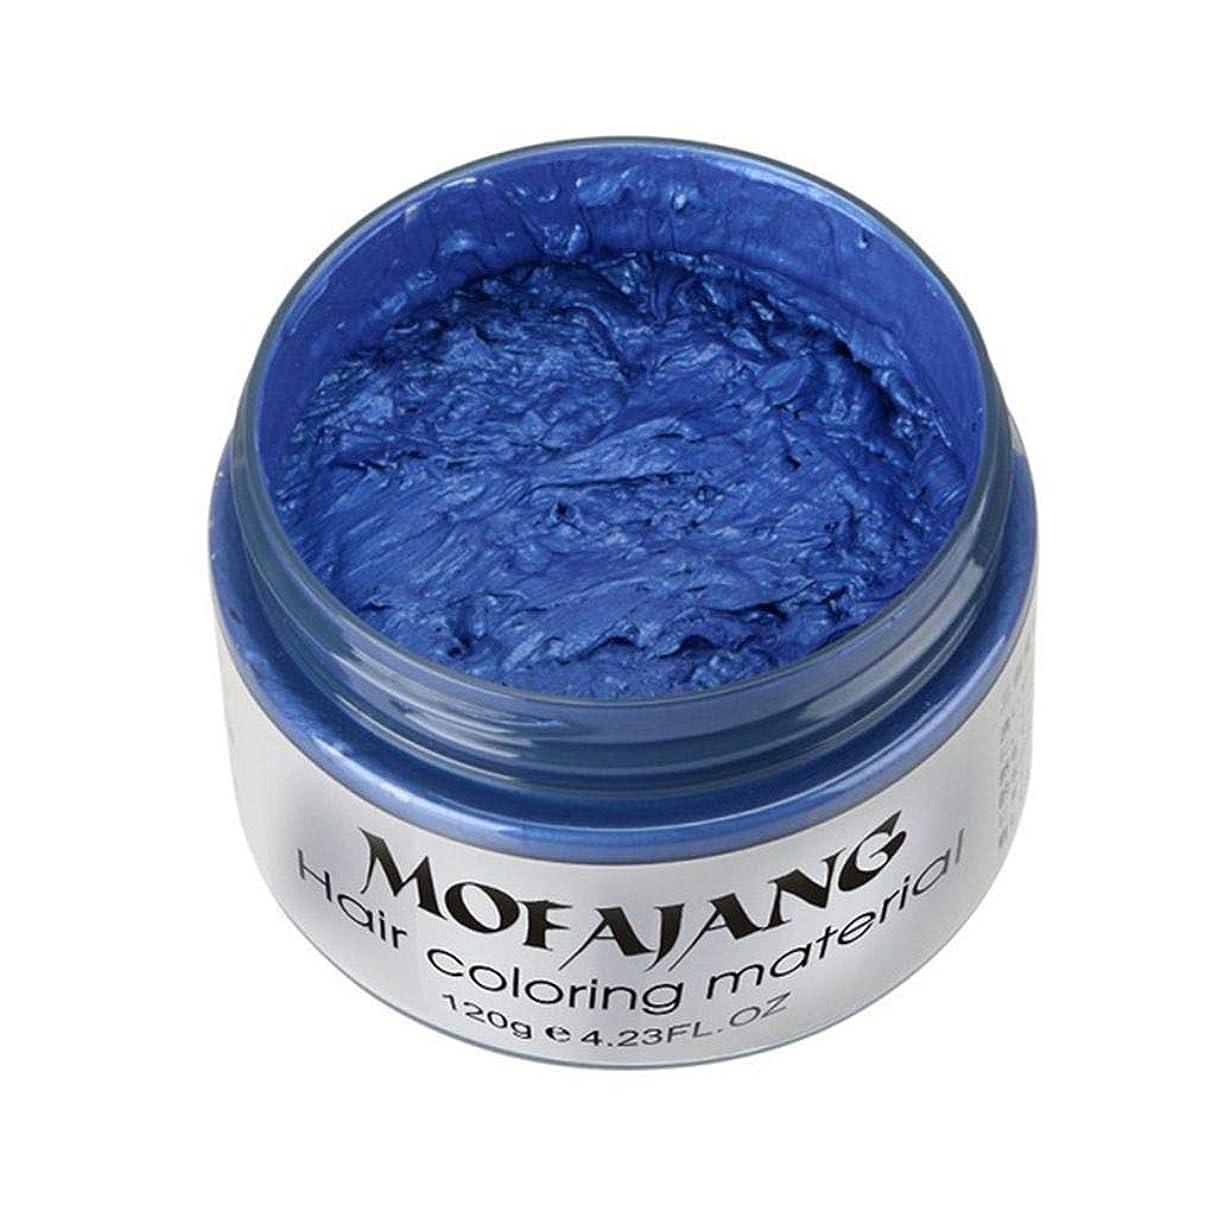 Muitlカラー一時染毛剤クリームDIYヘアカラーワックス泥ワンタイム成形モデルヘアカラークリームを貼り付け